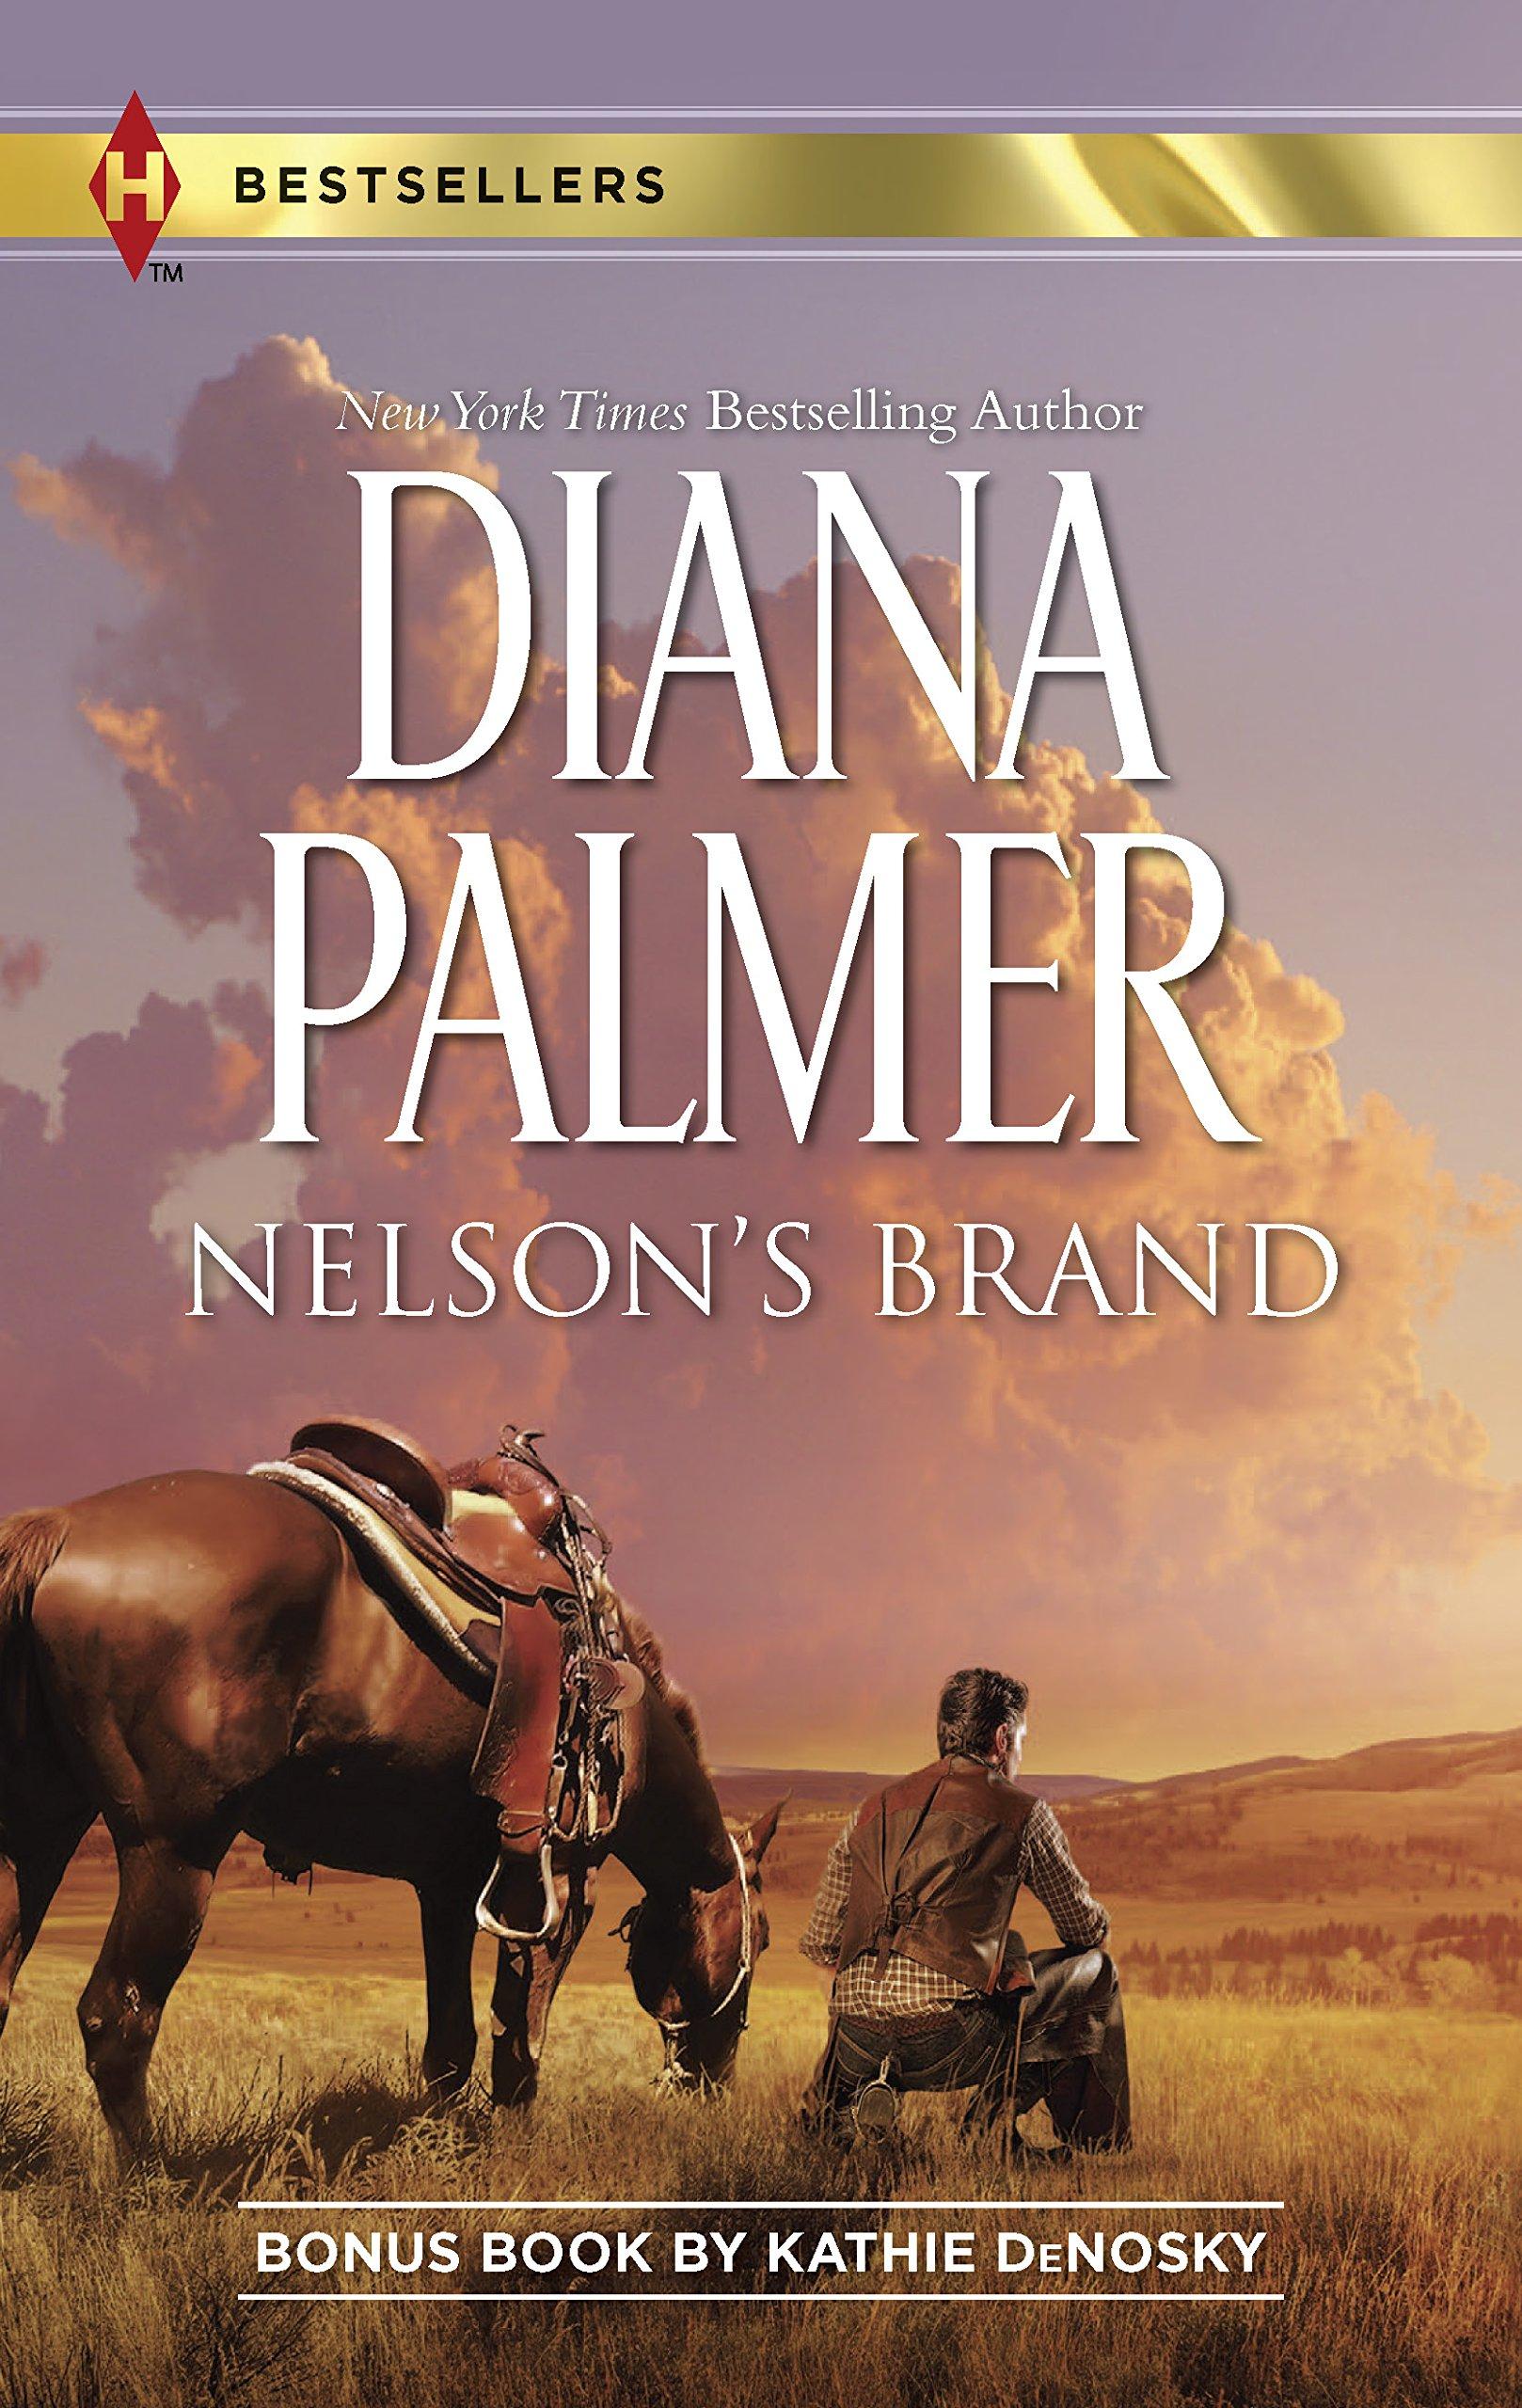 Nelson's Brand: Lonetree Ranchers: Colt (Harlequin Bestsellers)